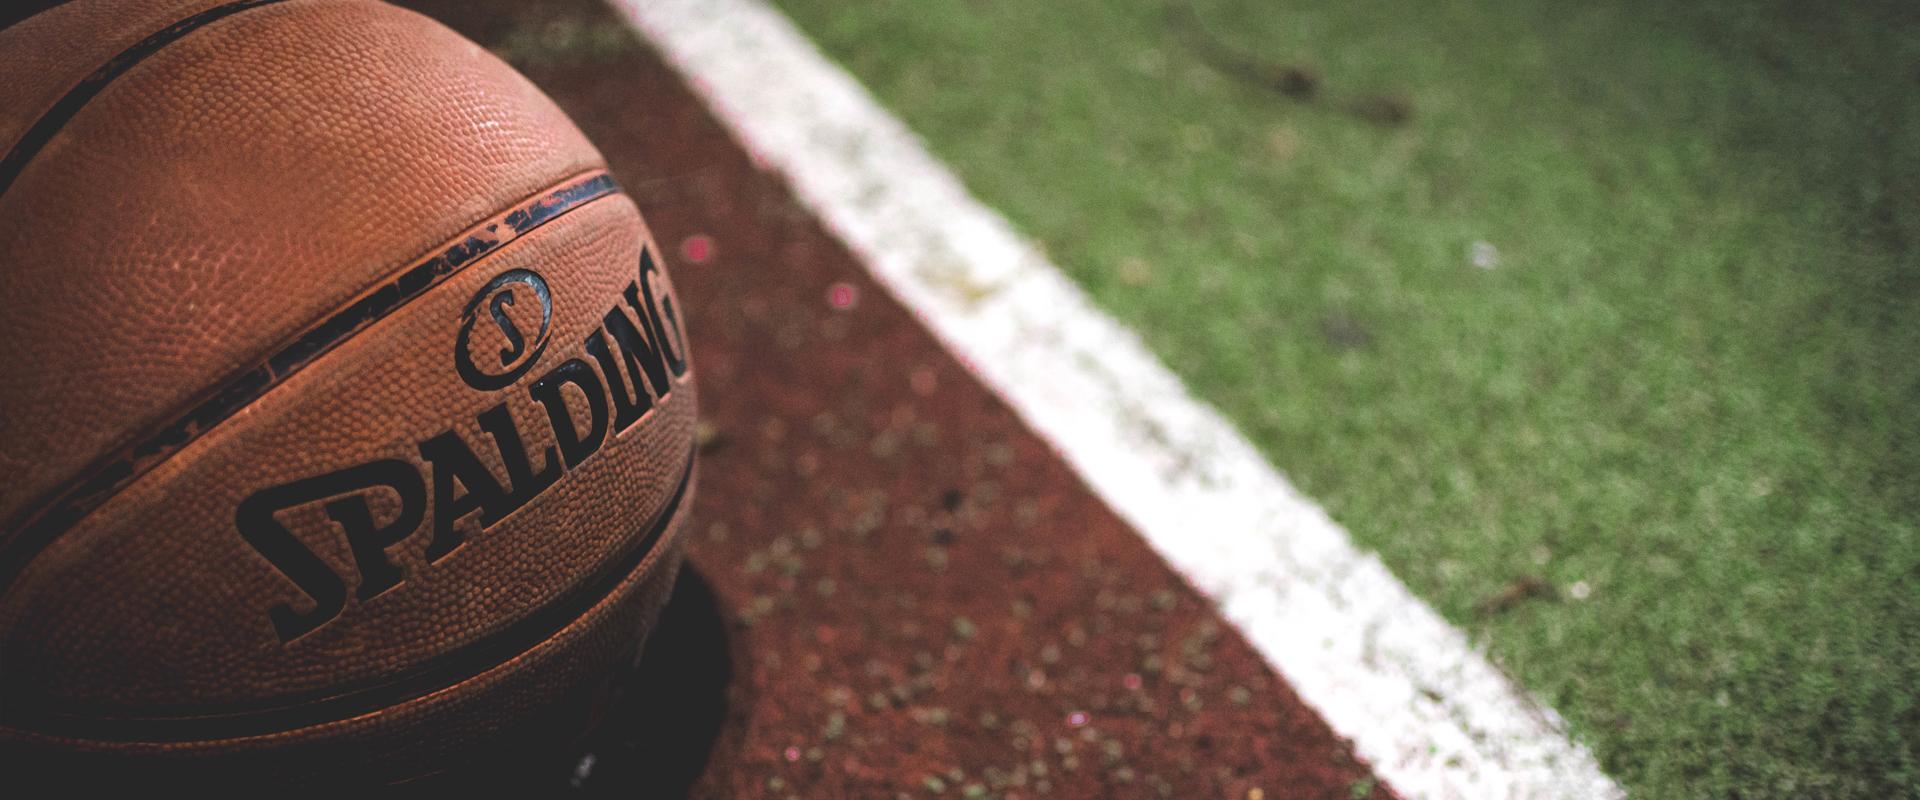 Permalink to: Sports Programs